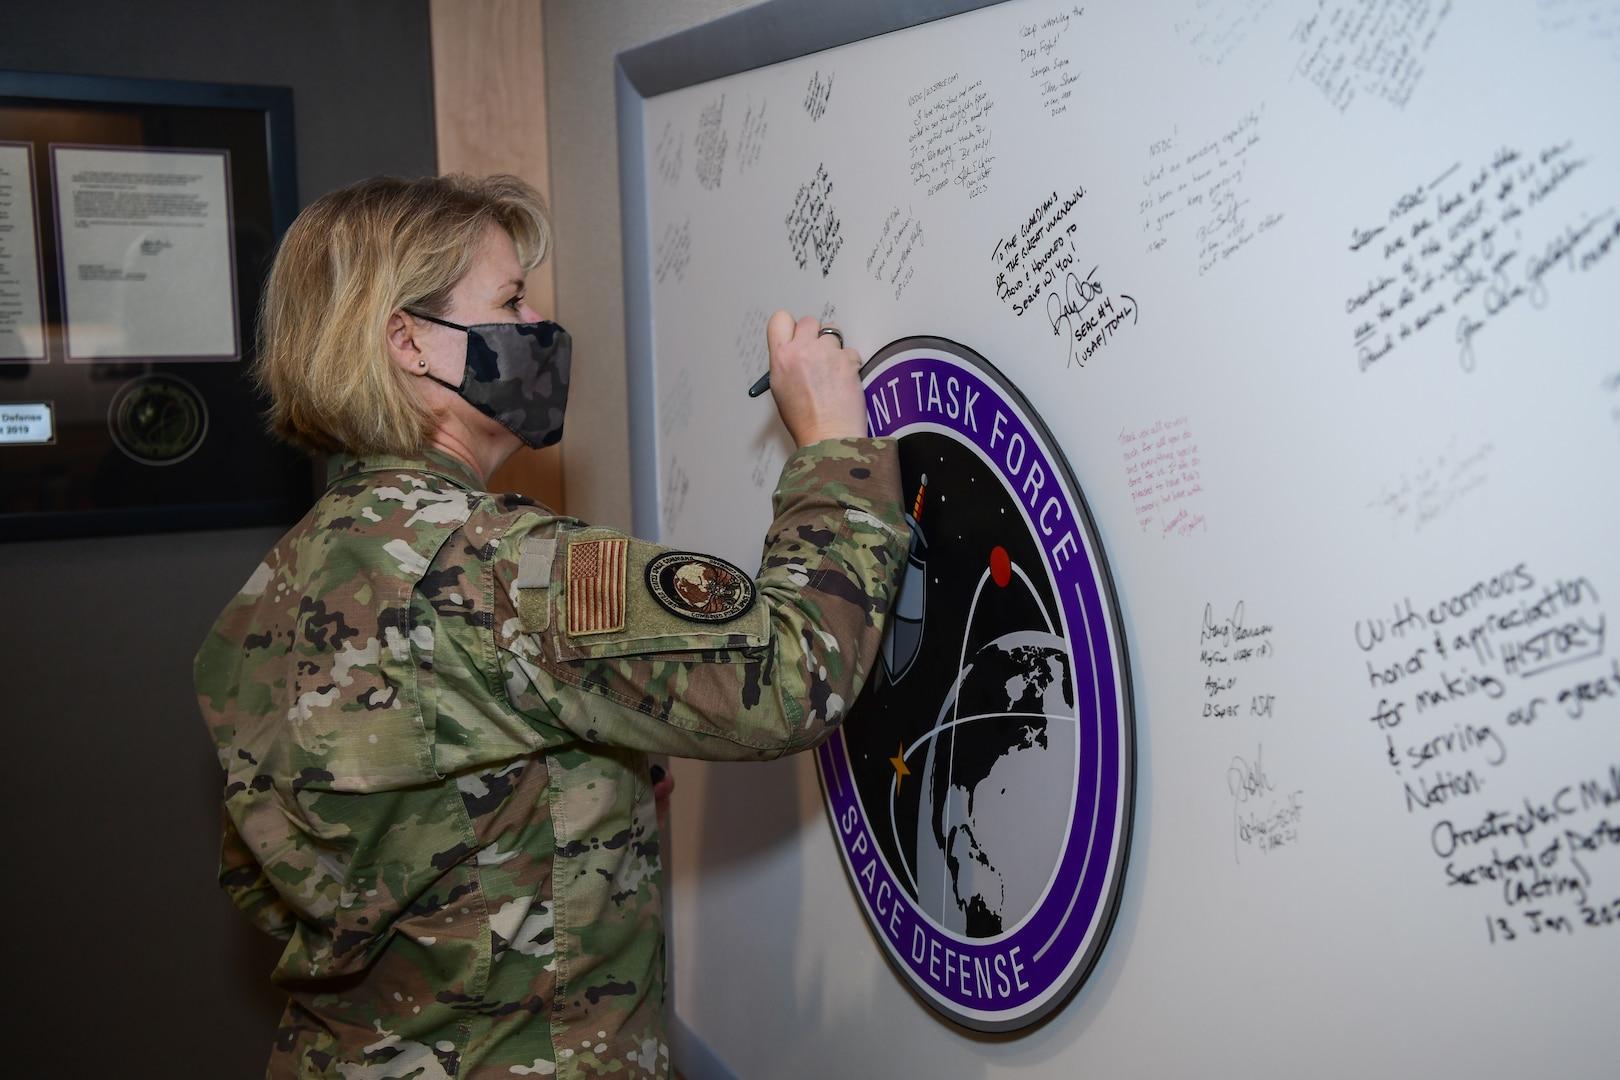 CFSCC leader signs board